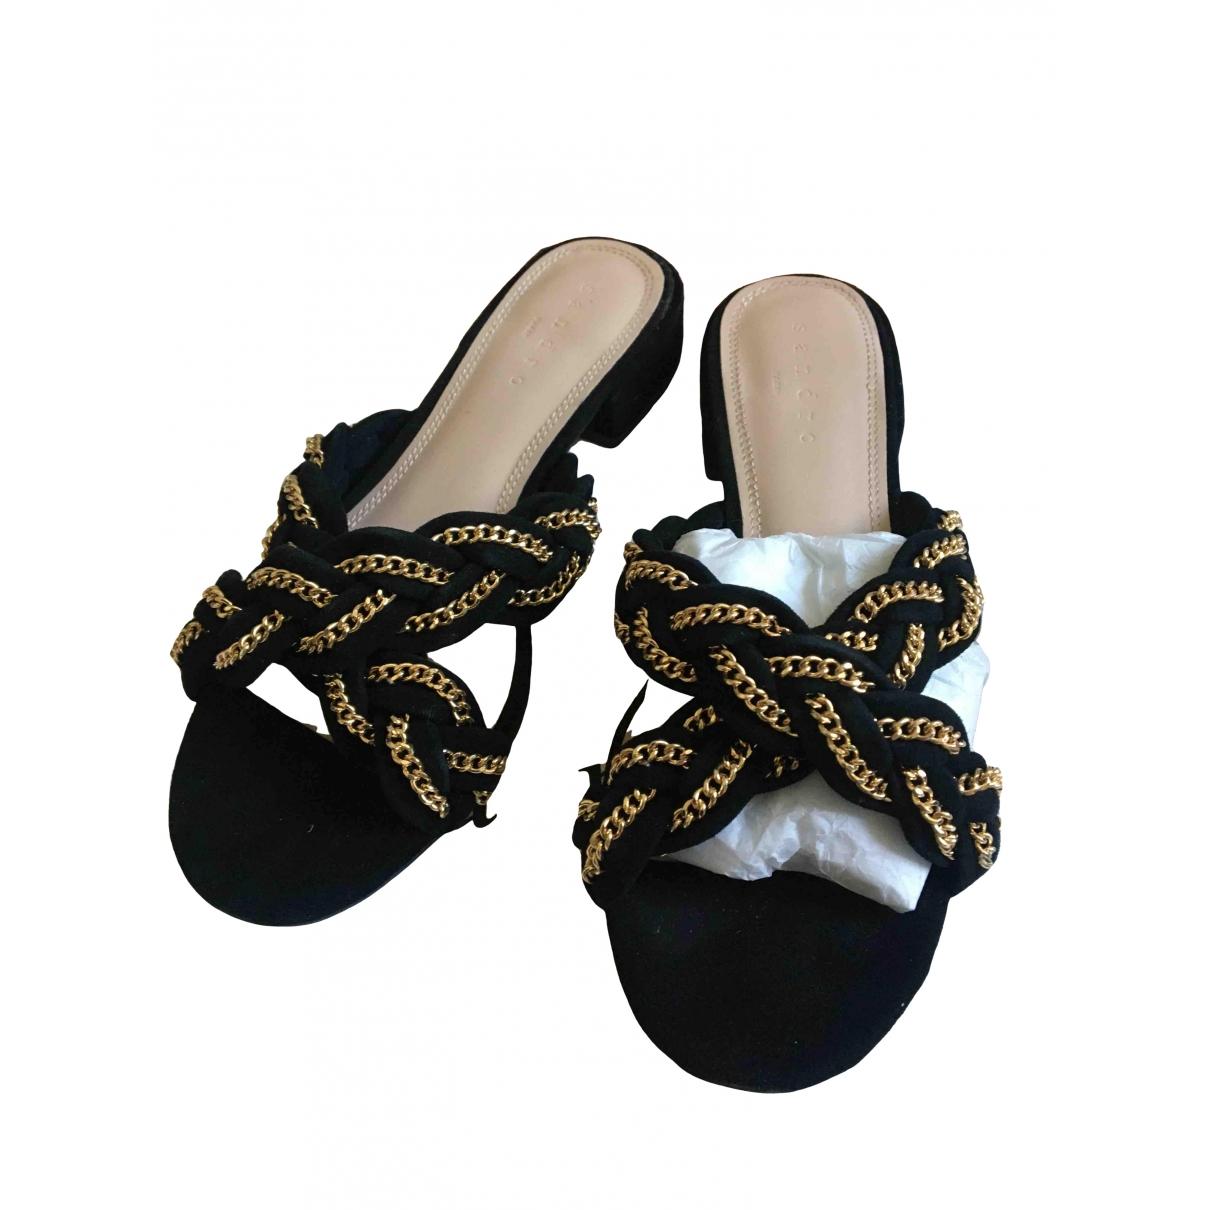 Sandro N Black Suede Sandals for Women 36 EU